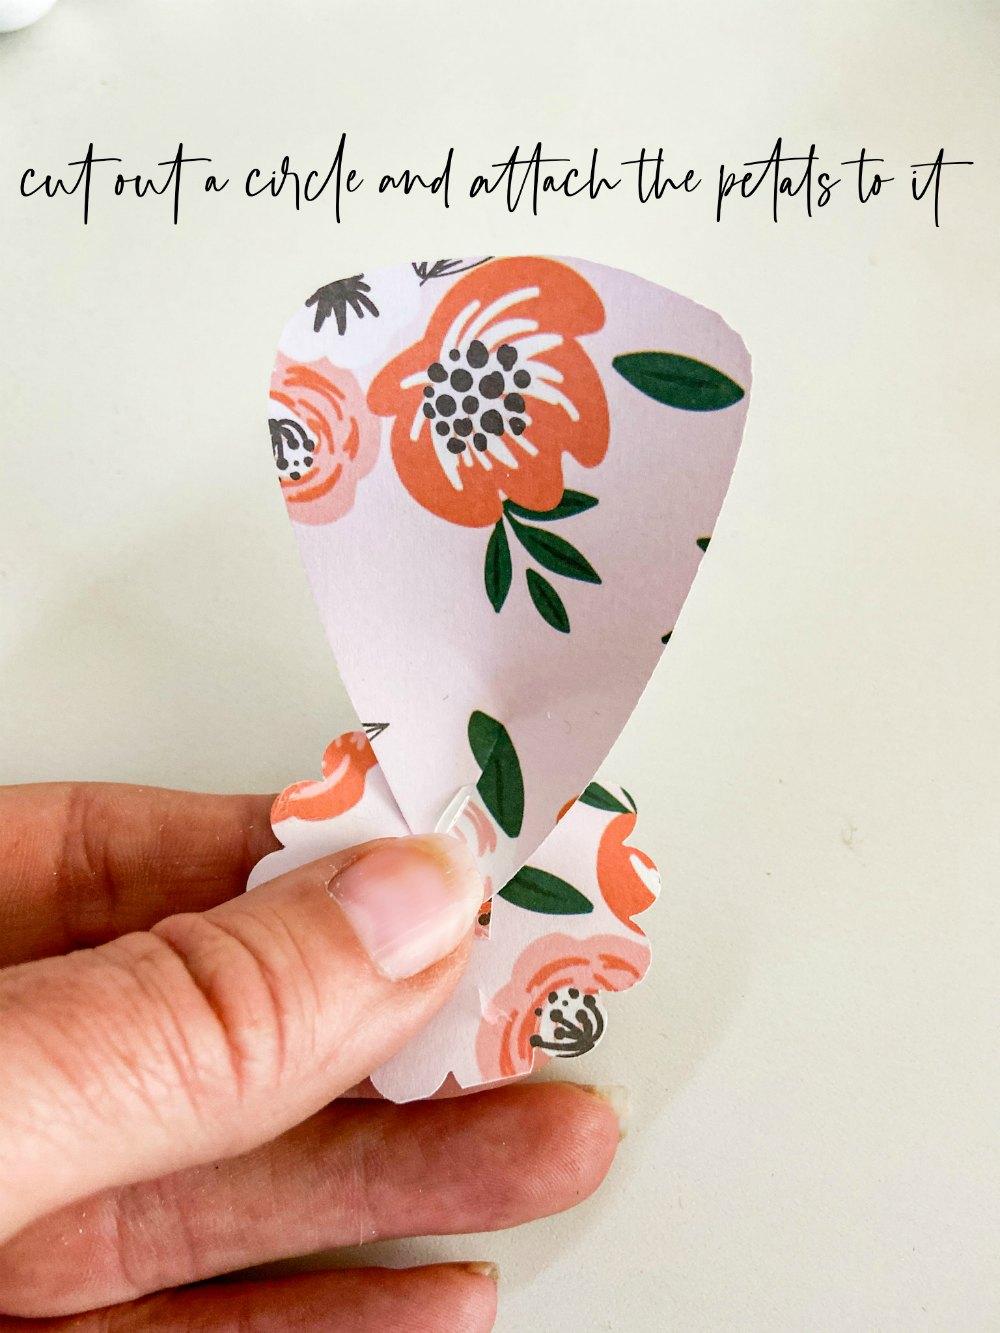 https://tatertotsandjello.com/wp-content/uploads/2020/06/paper-flower-templates-.jpg